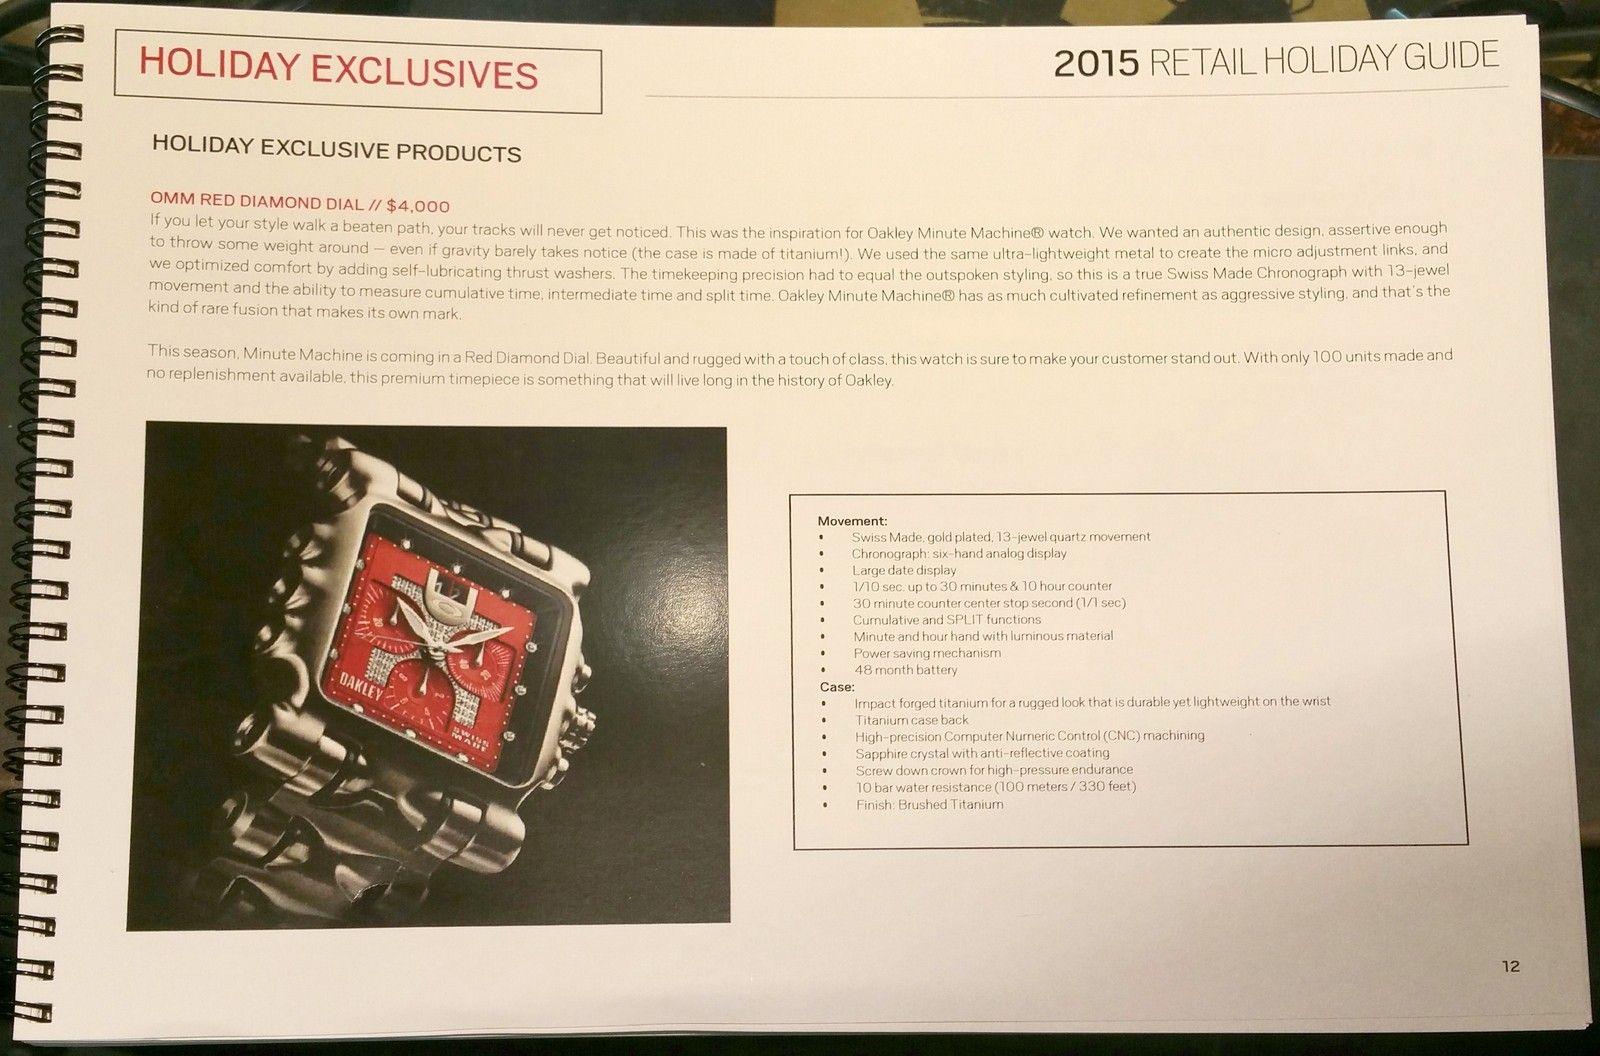 MM Red Face Diamond Dial Edition with Brushed Titanim Bracelet $4K - red.diamond.jpg